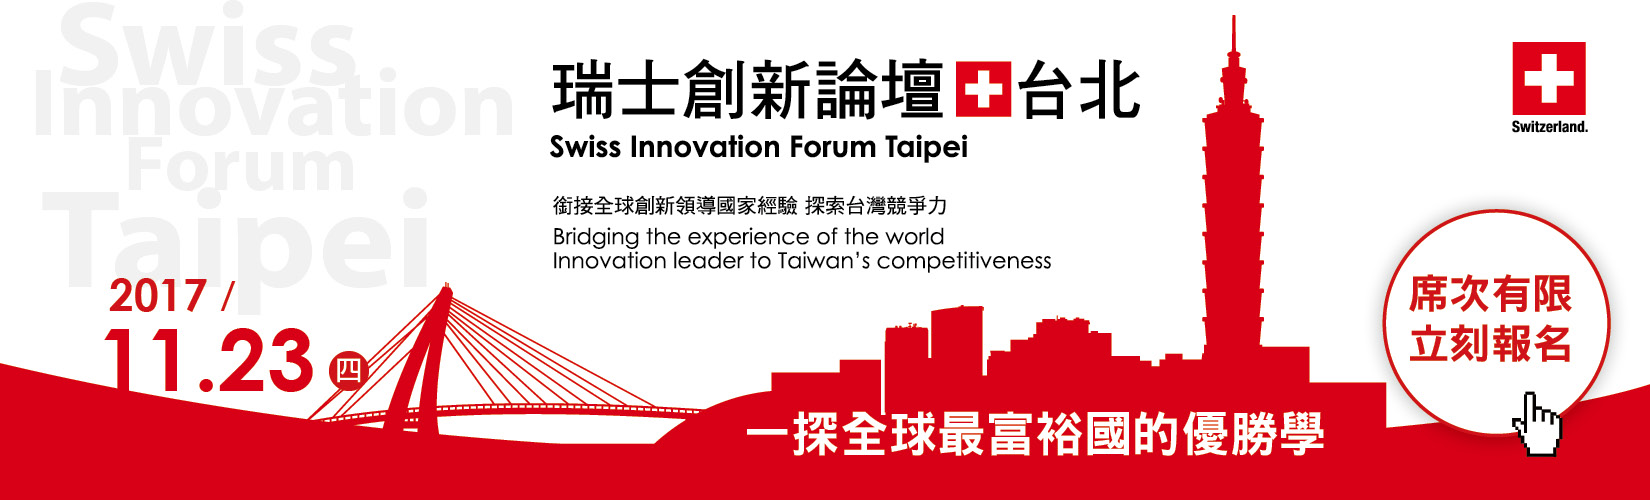 【瑞士創新論壇台北】Swiss Innovation Forum Taipei